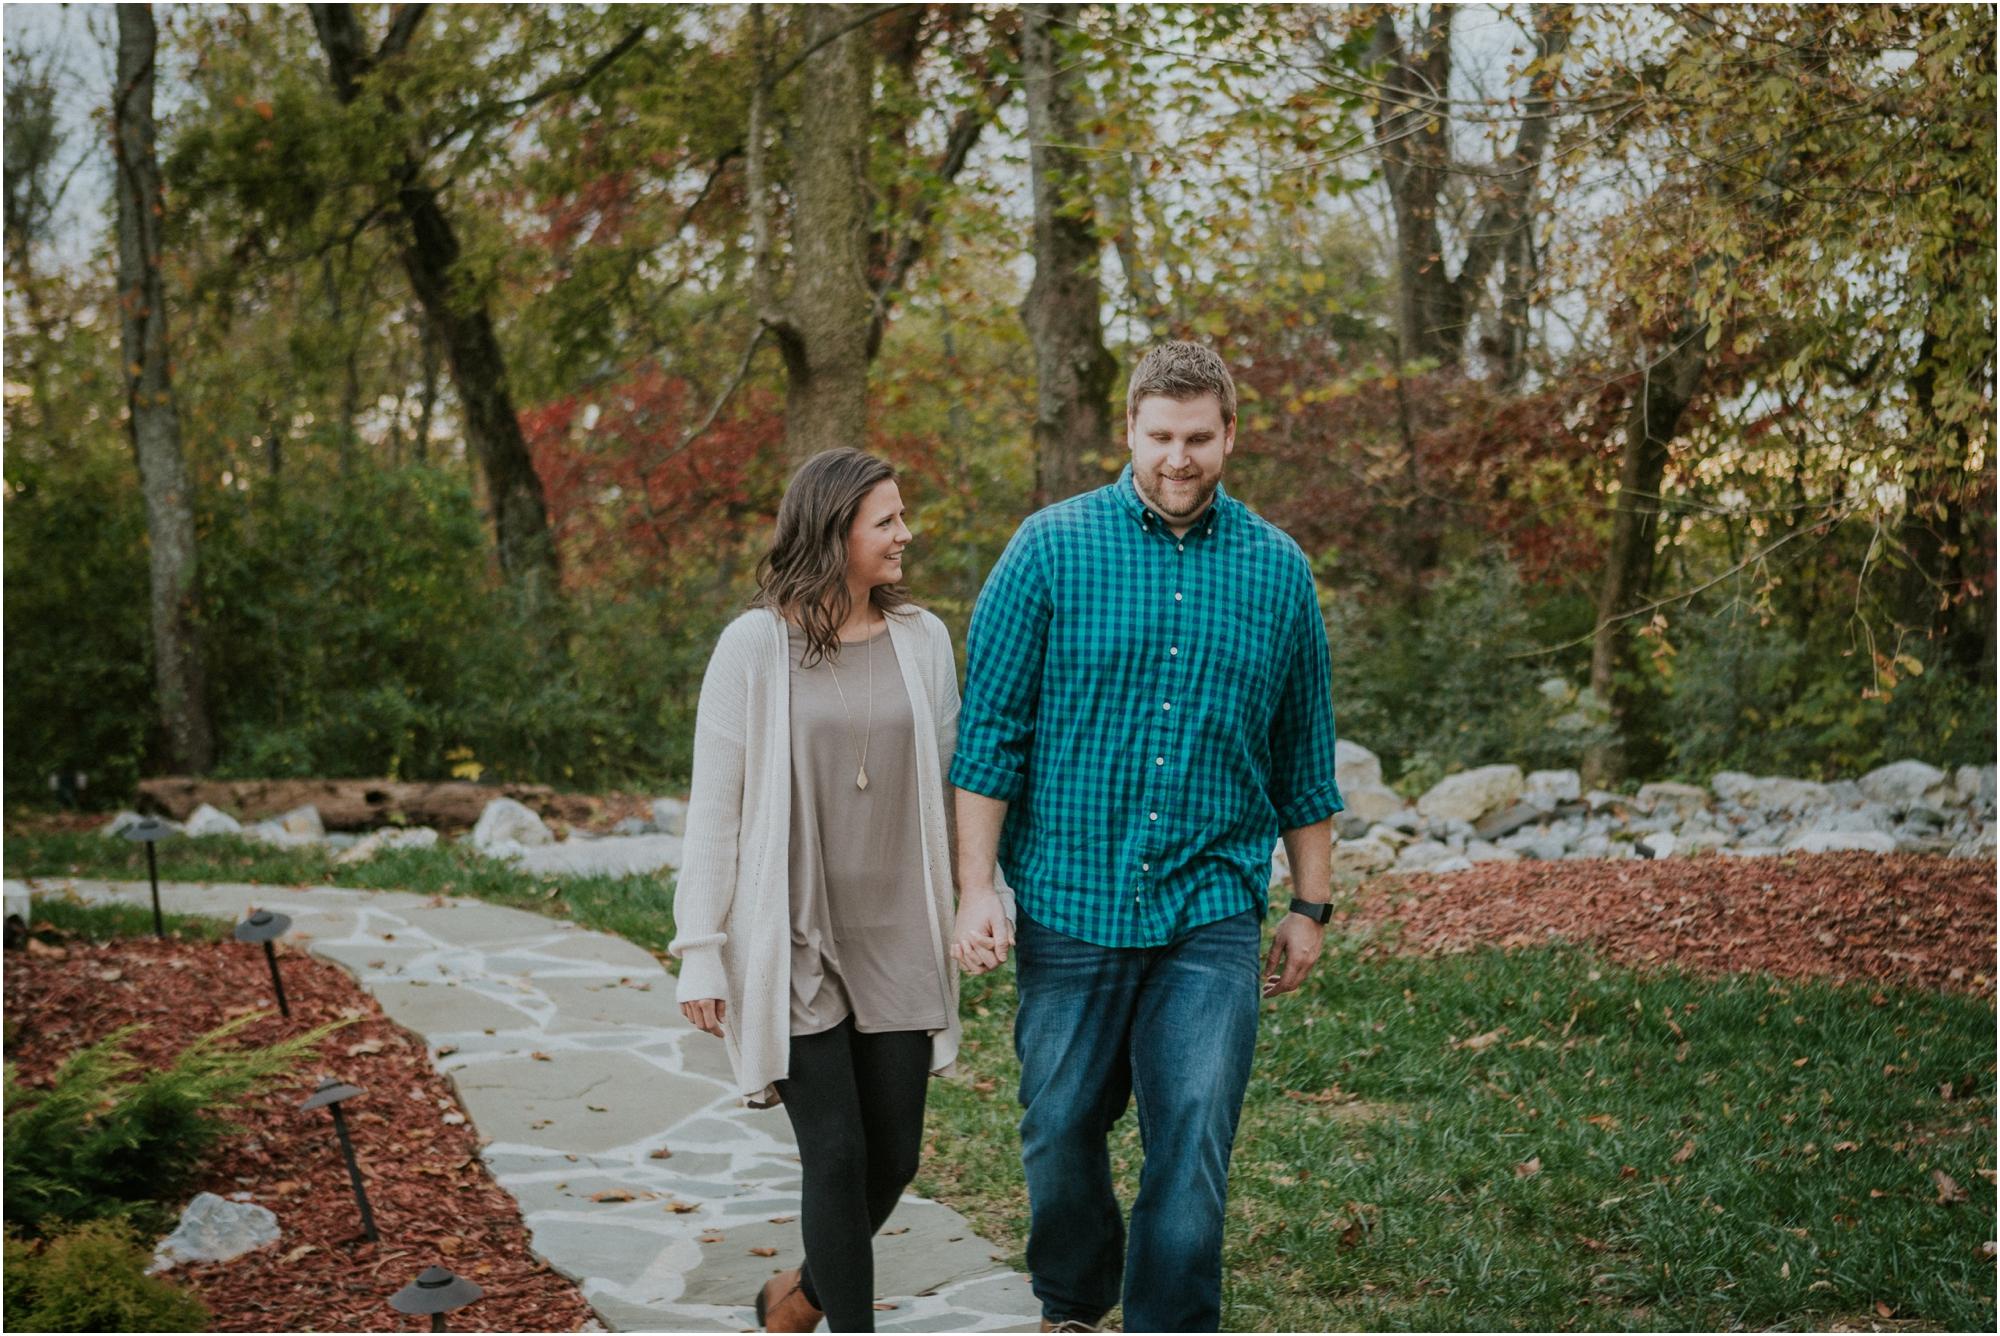 katy-sergent-millstone-limestone-tn-rustic-fall-engagement-session-adventurous-outdoors-intimate-elopement-wedding-northeast-johnson-city-photographer_0005.jpg